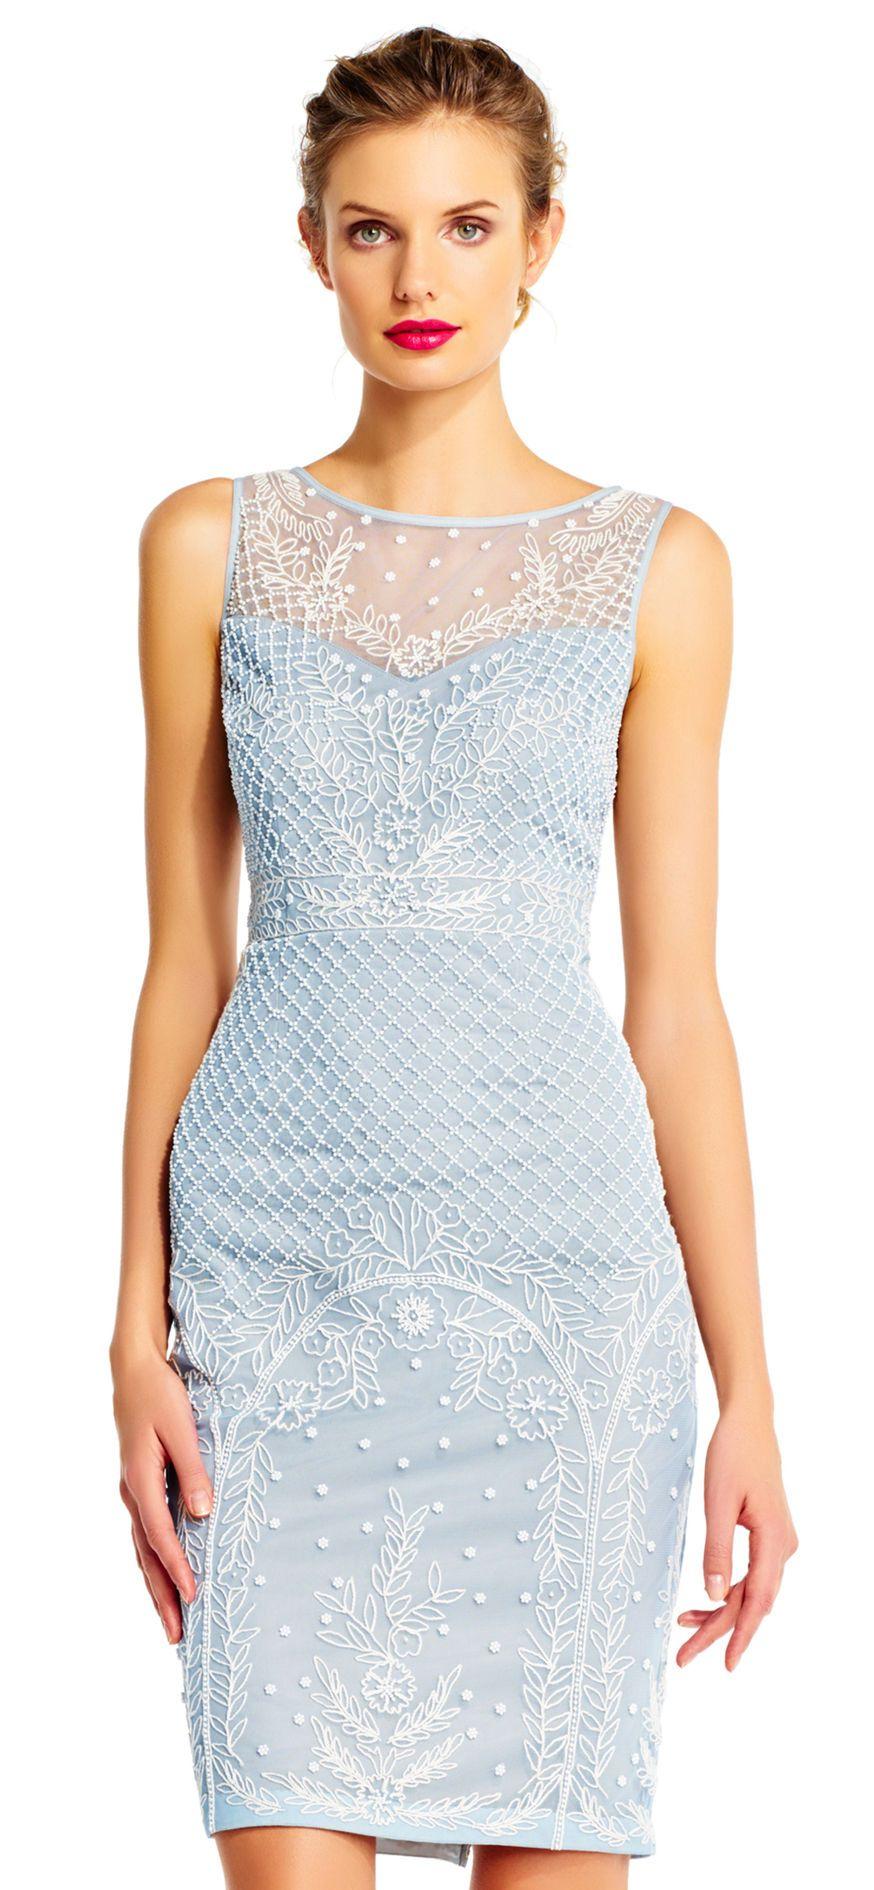 aa05953b Adrianna Papell | Sleeveless Pearl Beaded Sheath Dress with Illusion  Neckline